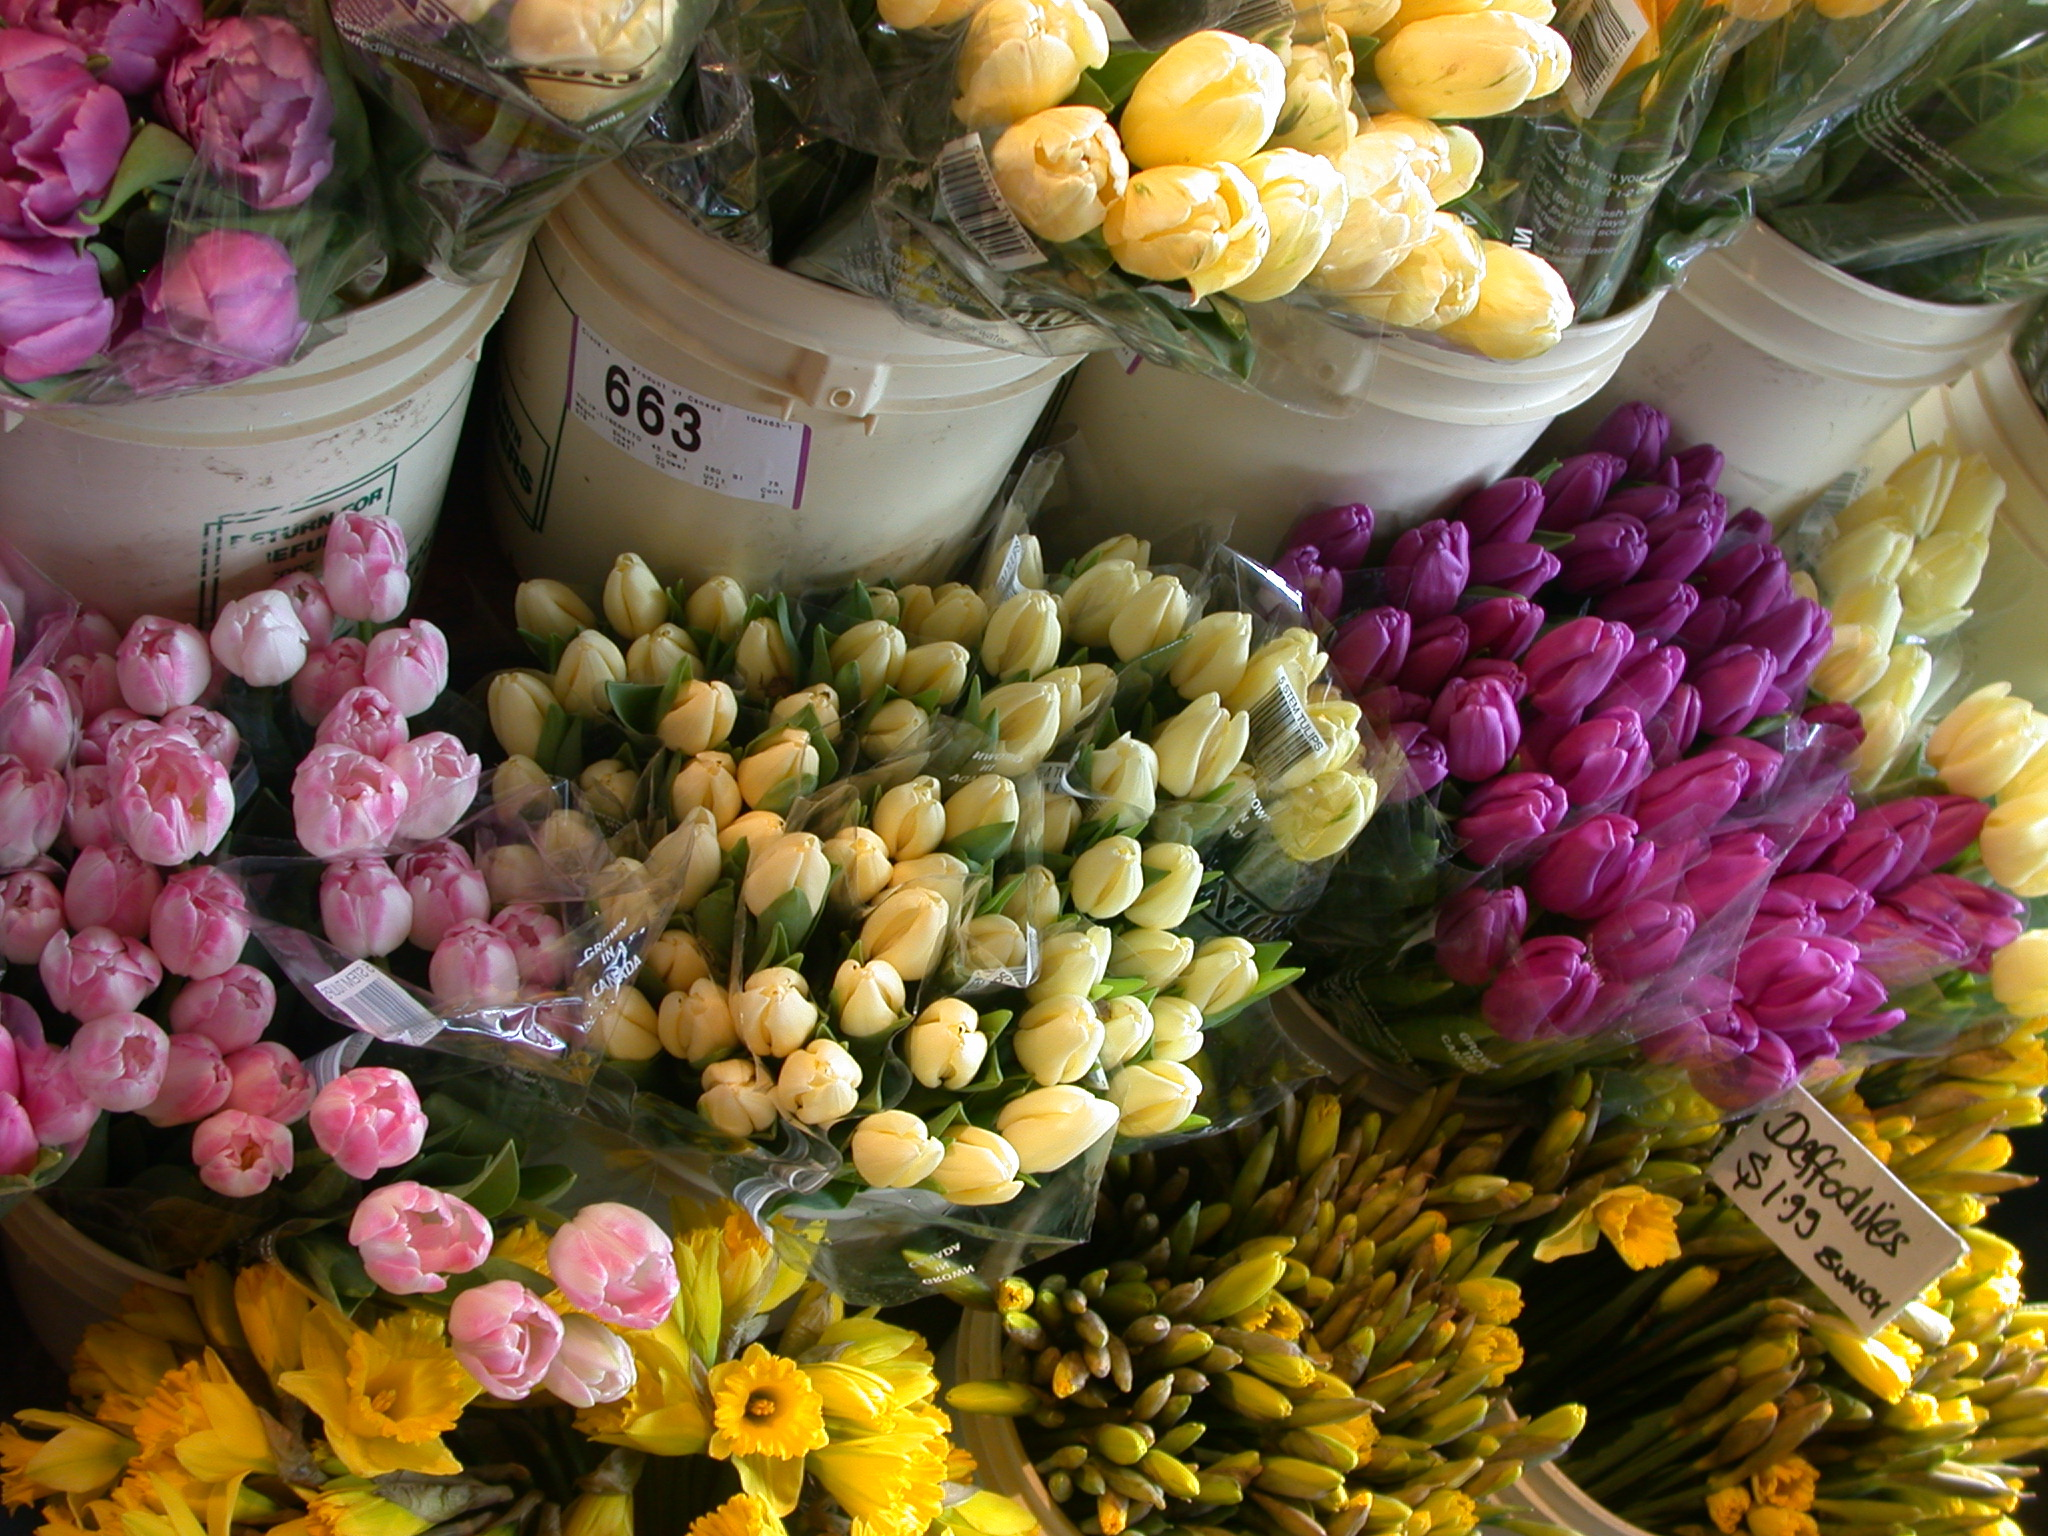 Flower market at Granville Island